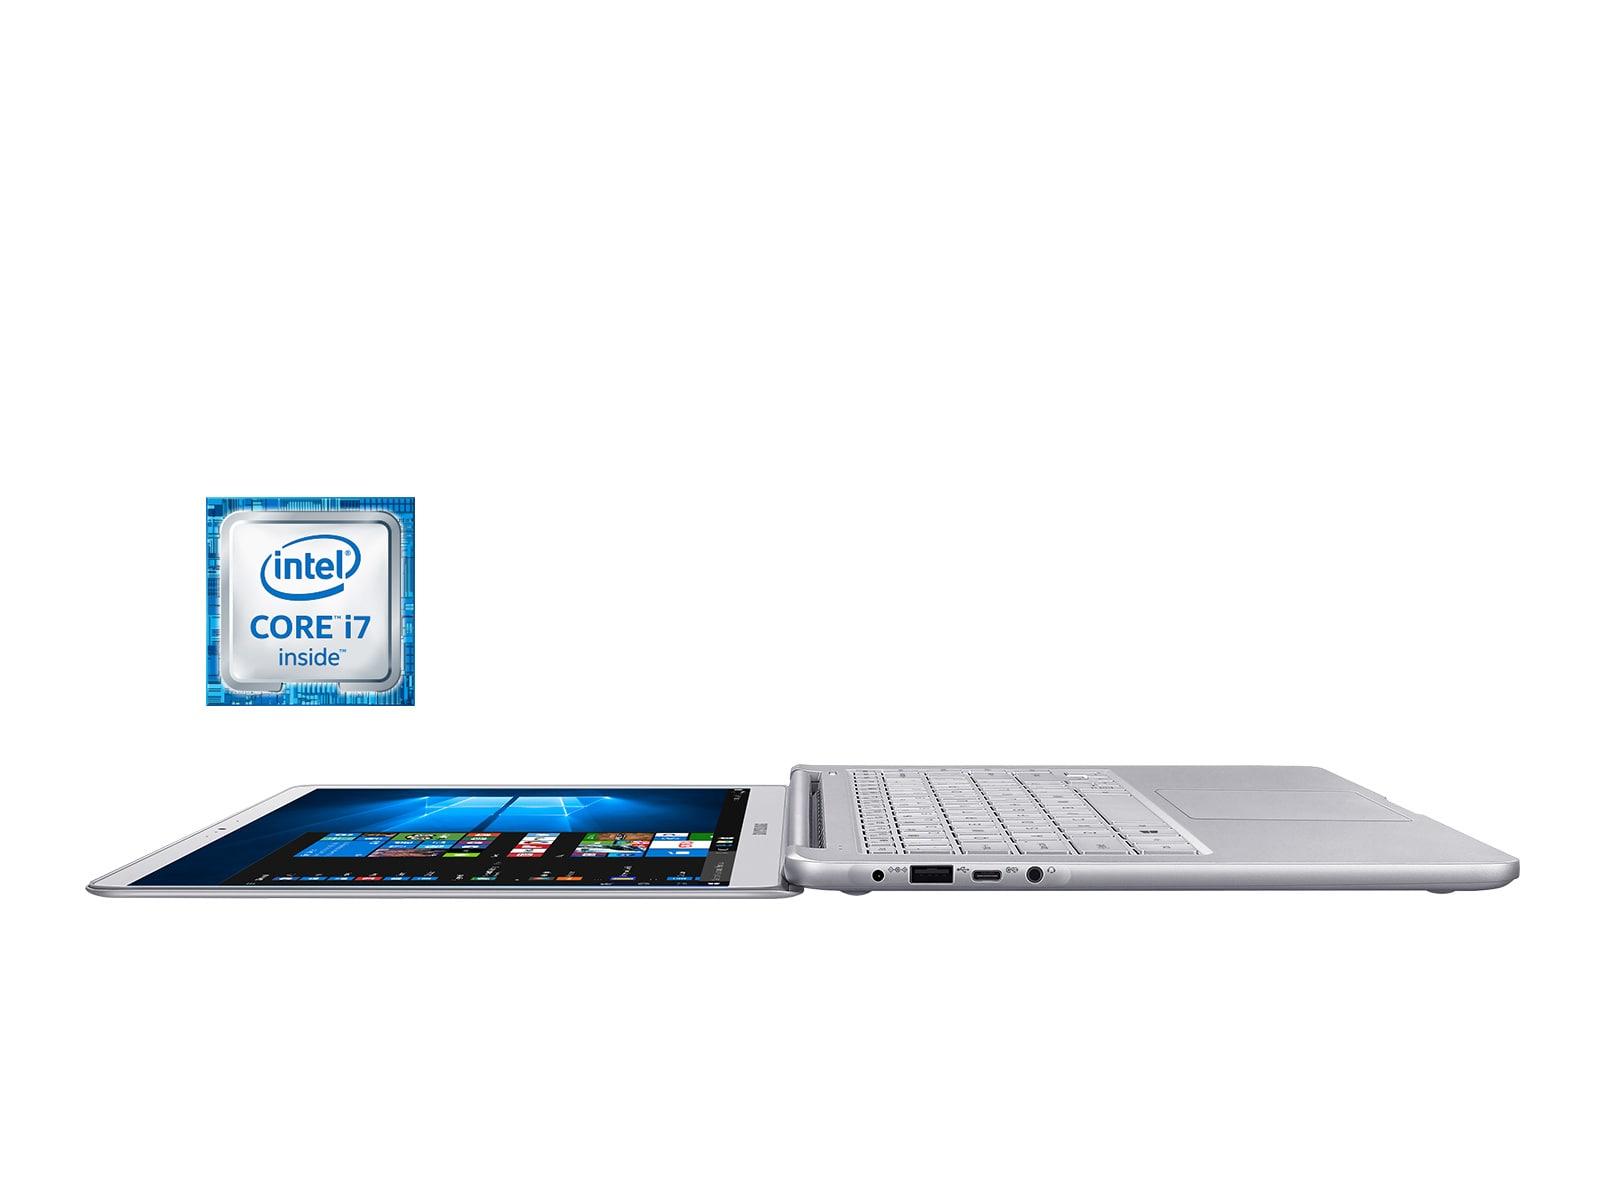 Samsung Notebook 9 NP900X5N-X01US